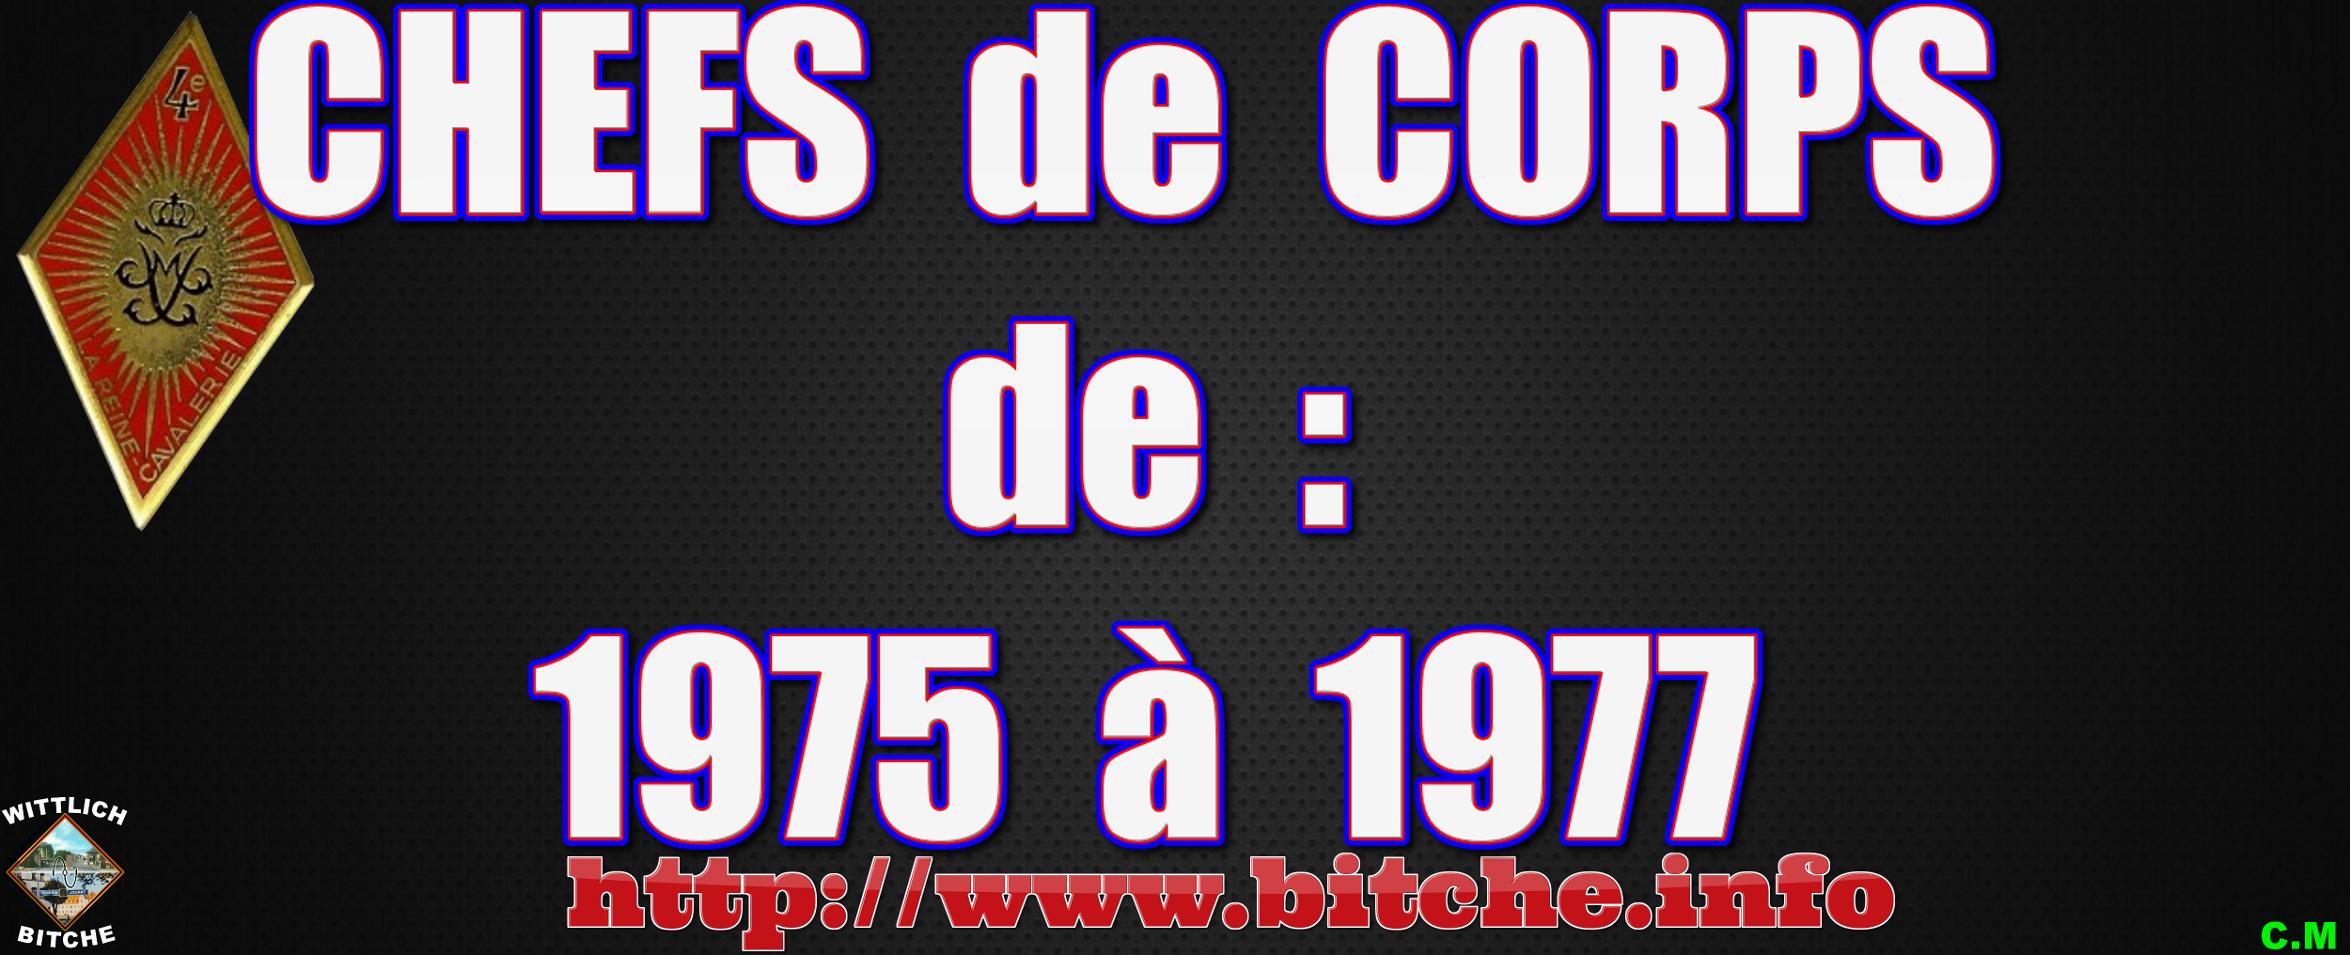 CHEFS de CORPS de 1975